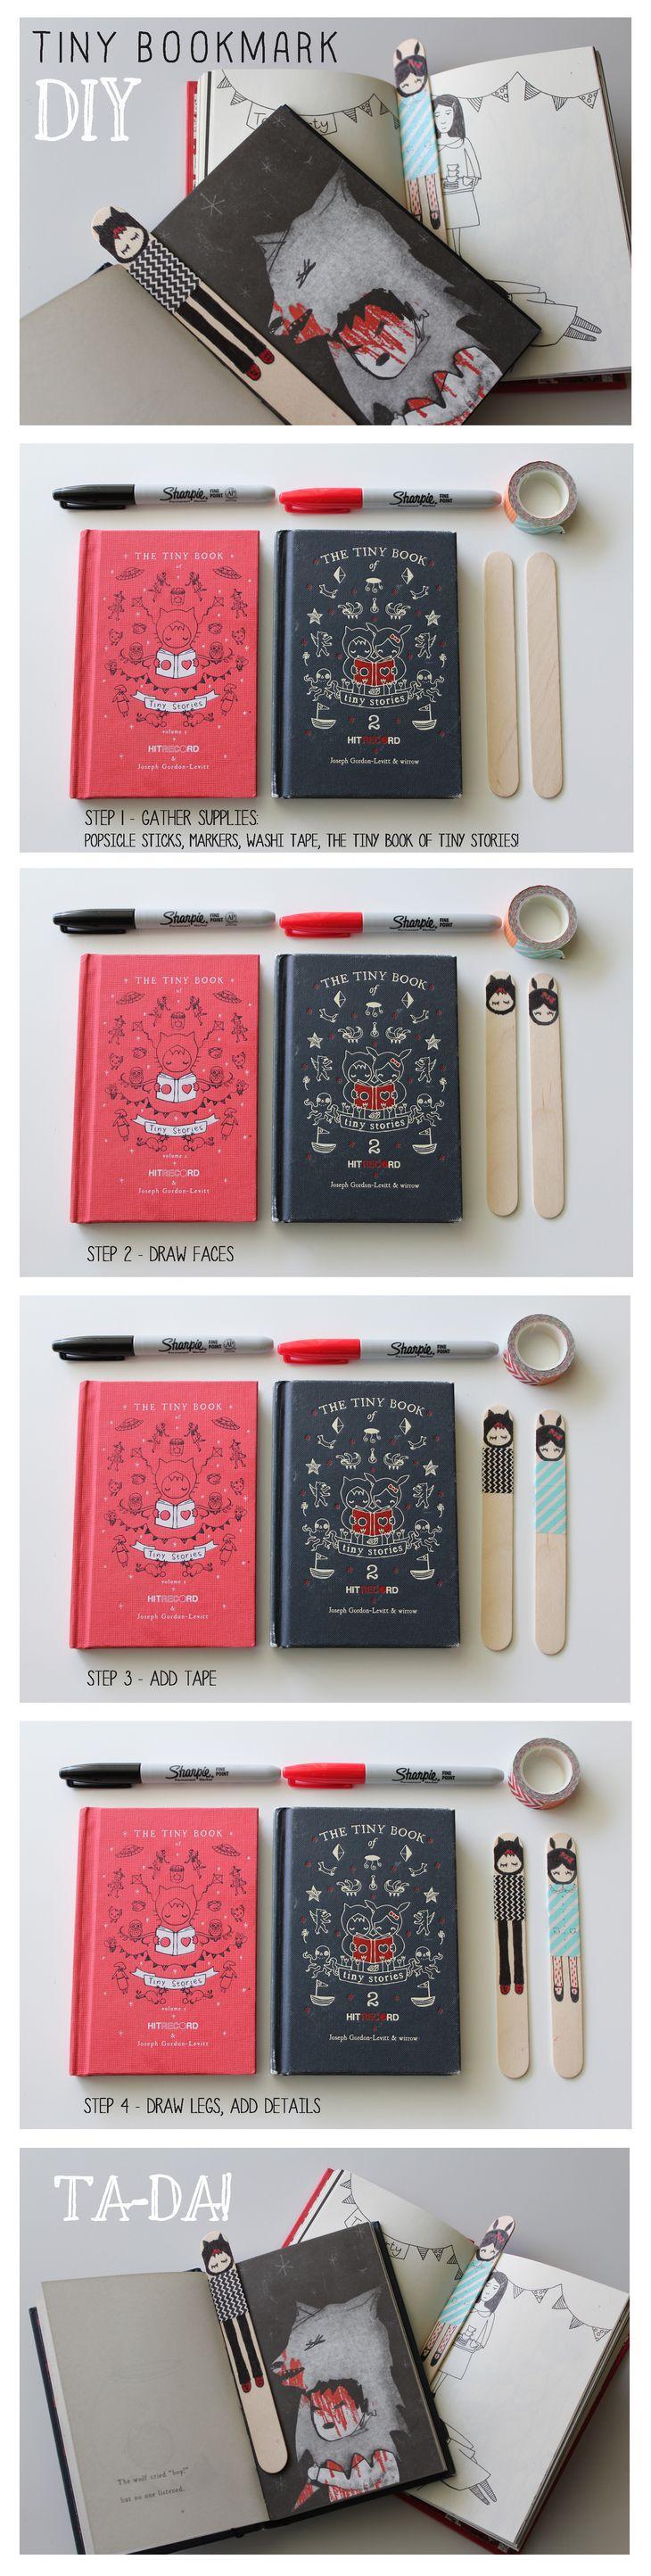 Best HITRECORD Tiny Bookmark DIY